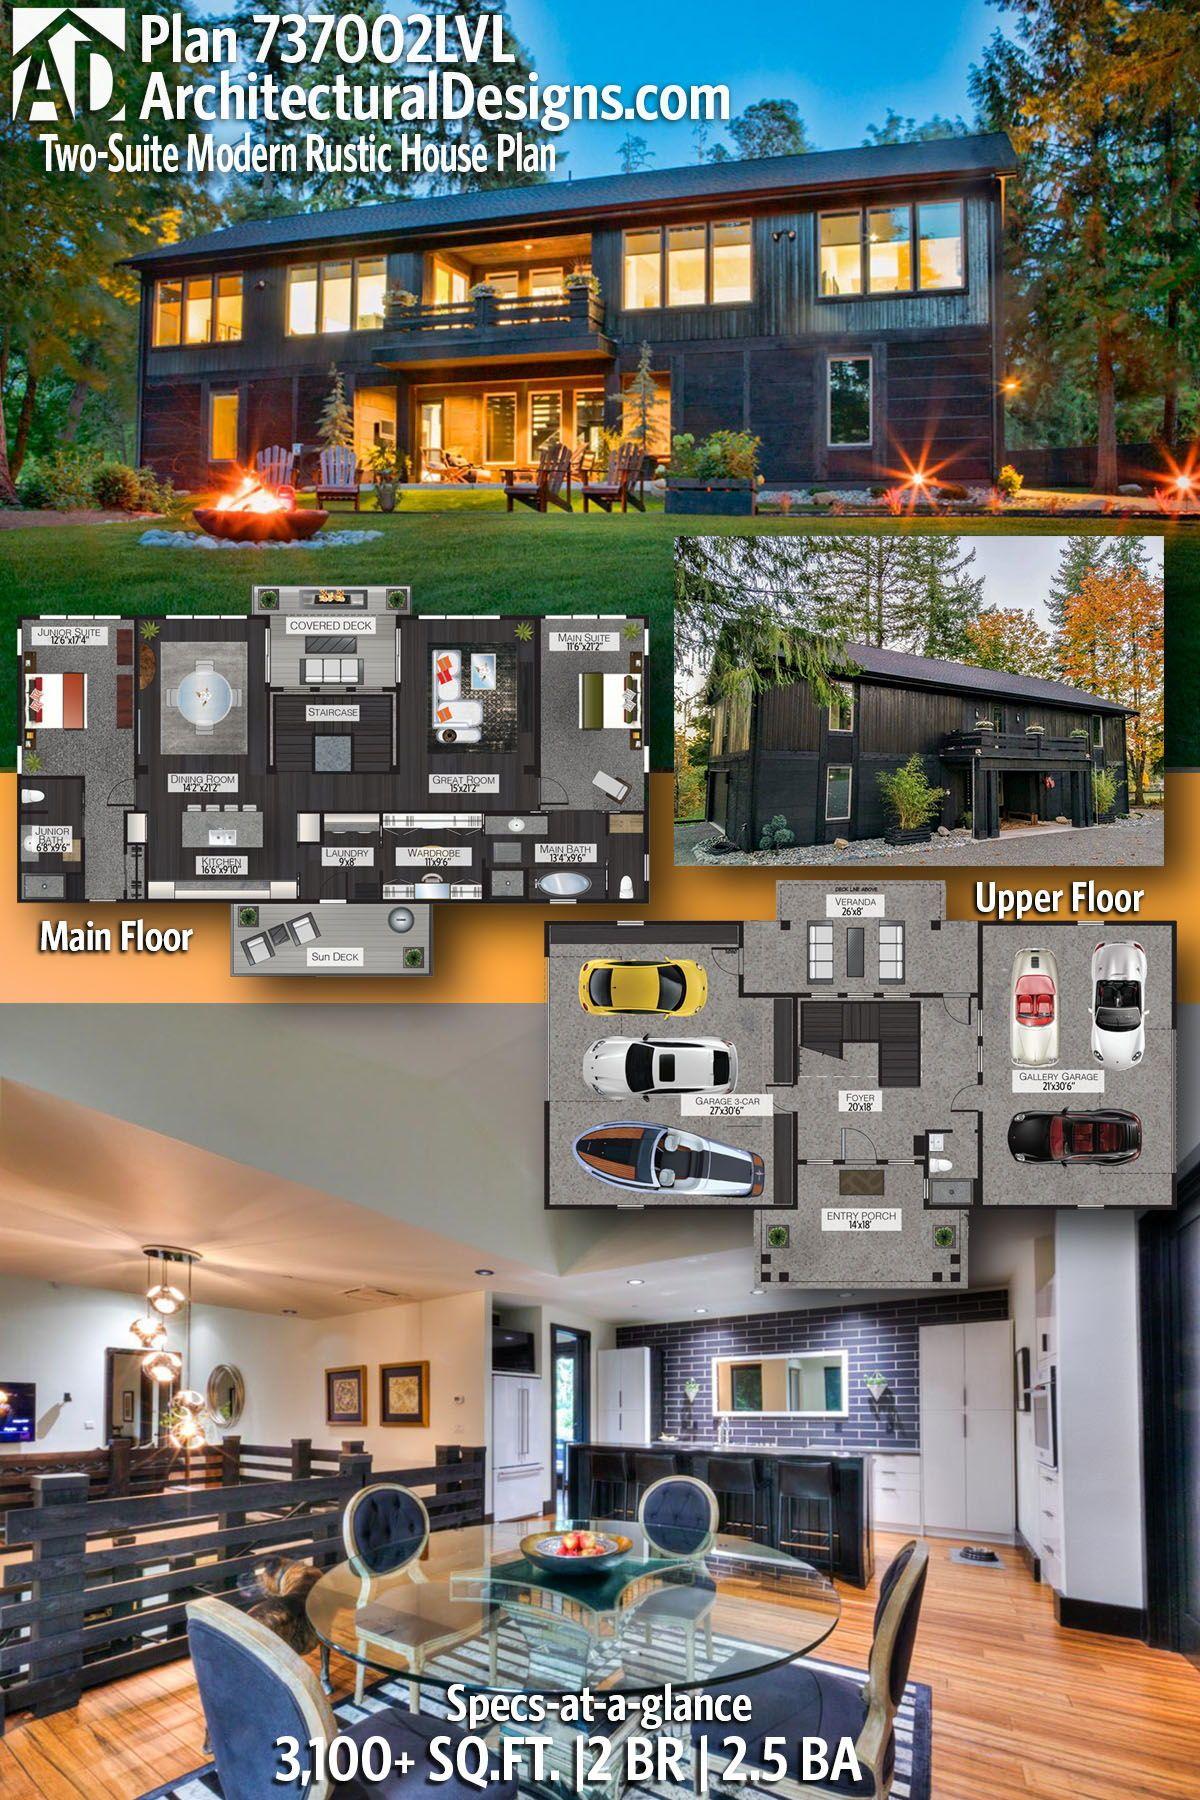 Plan 737002LVL: Two-Suite Modern Rustic House Plan